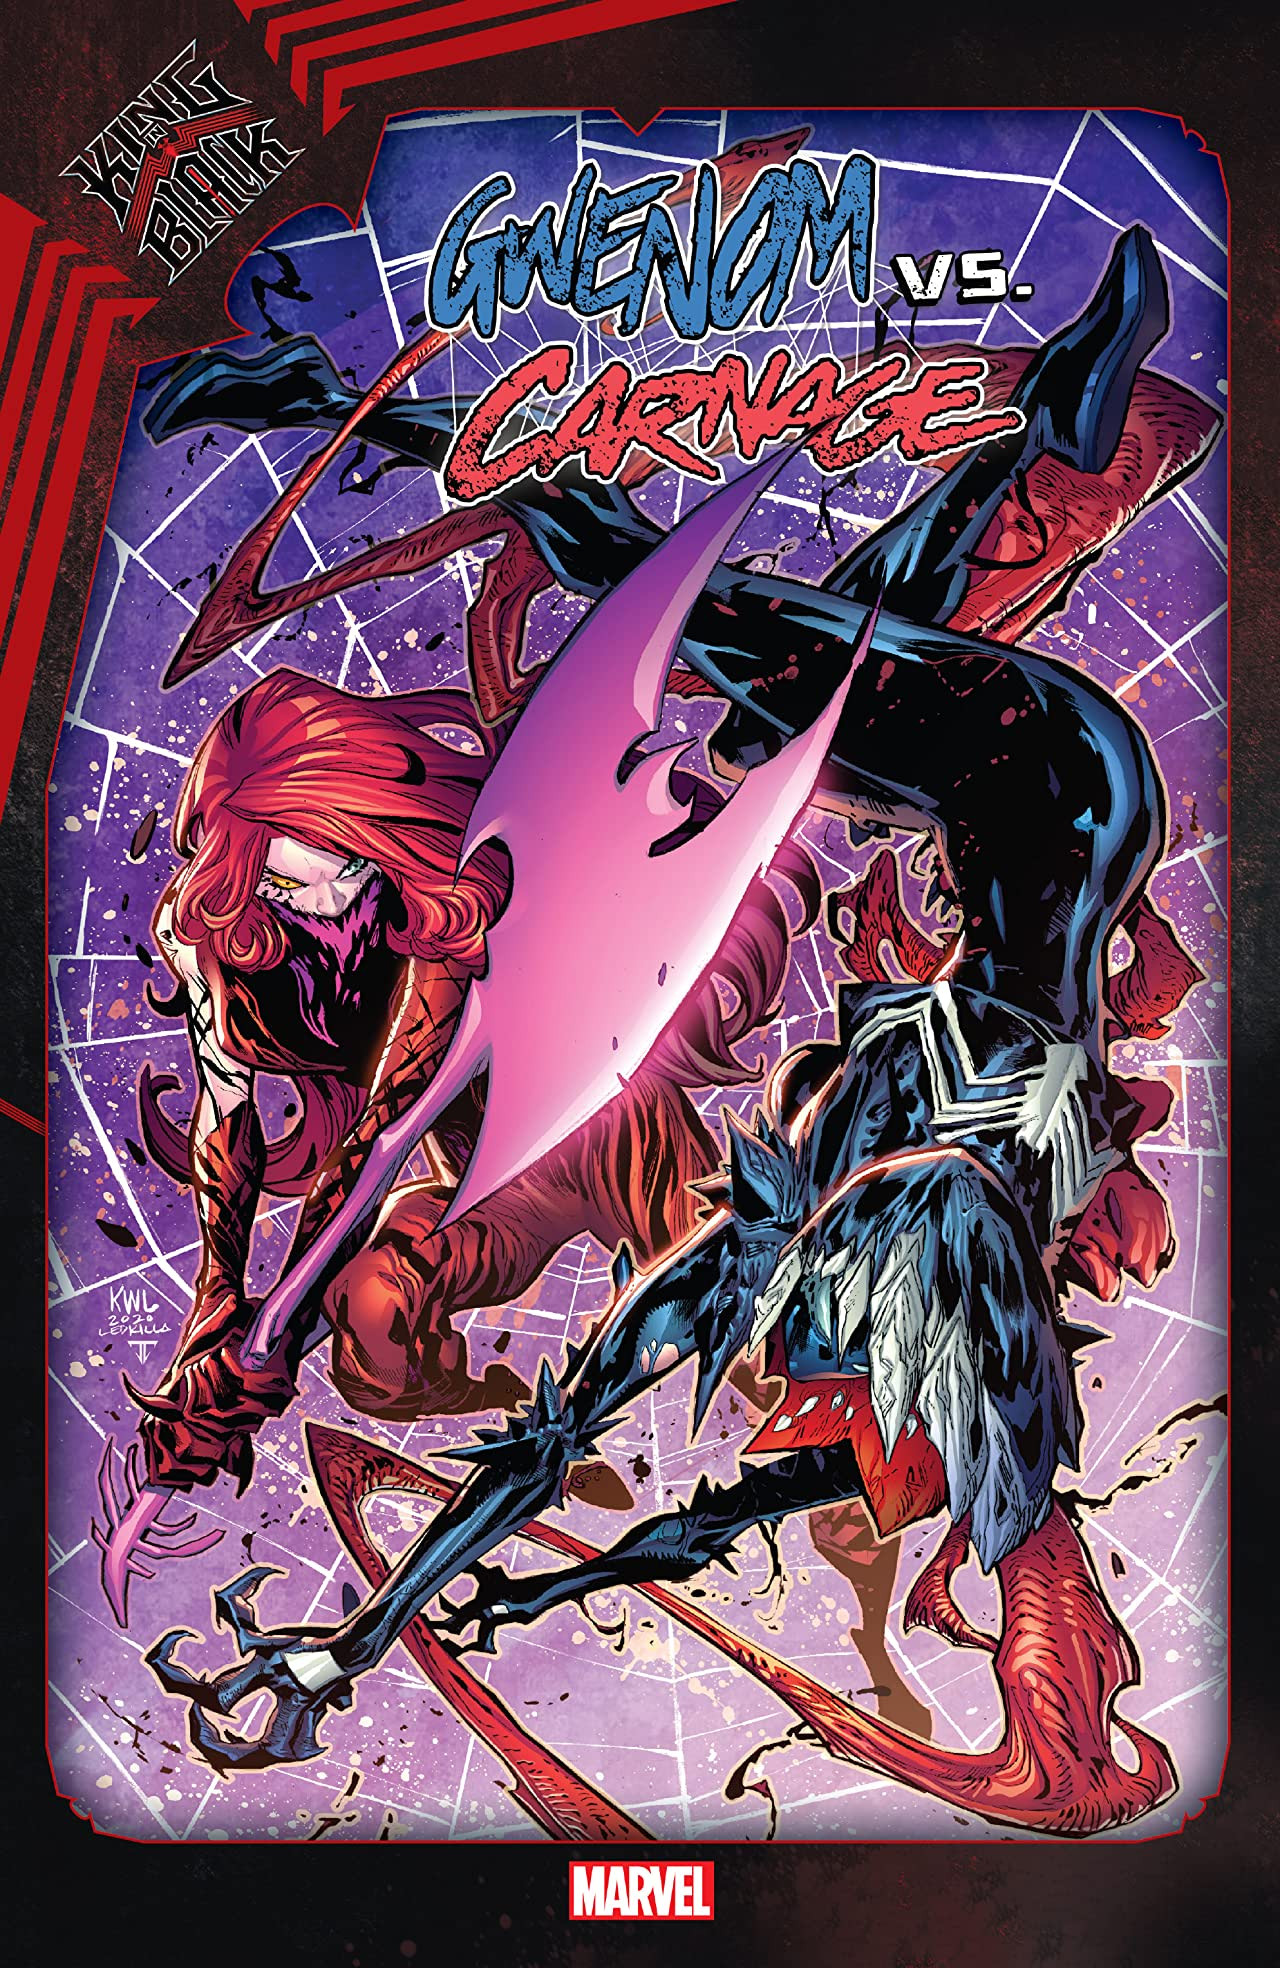 King In Black: Gwenom Vs. Carnage (Trade Paperback)